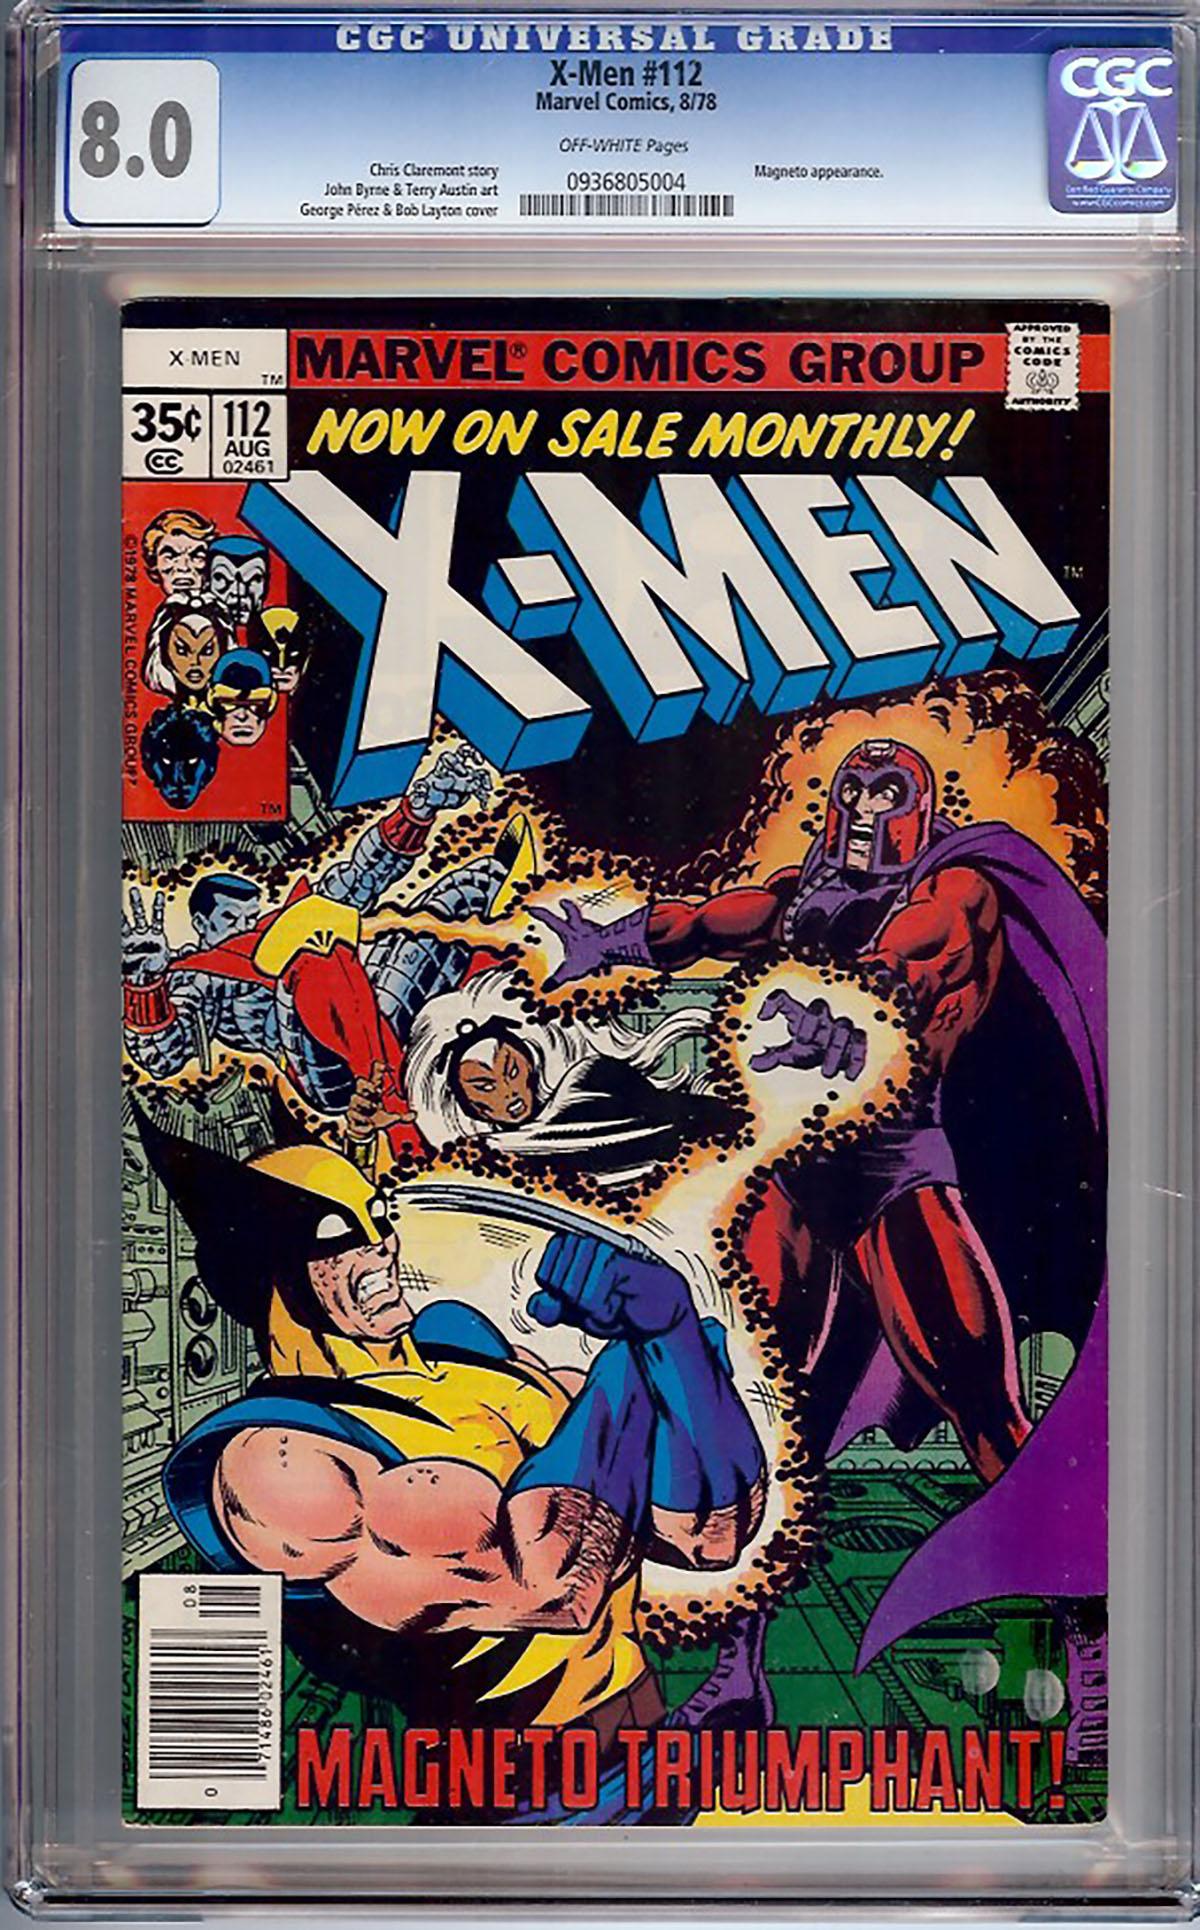 X-Men #112 CGC 8.0 ow